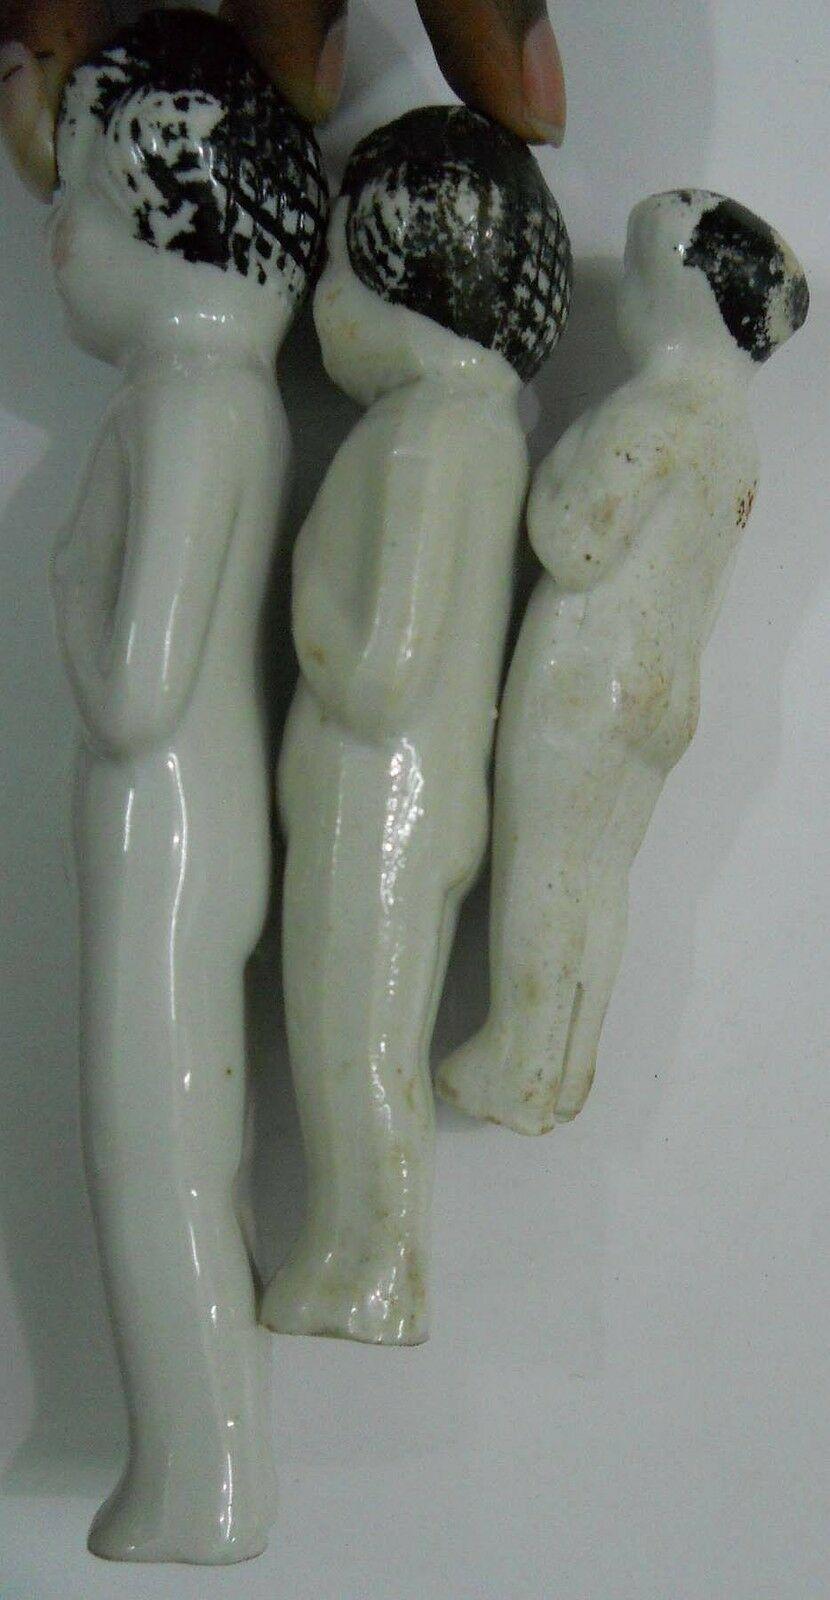 Vintage Porcelain Figurine 3 Girls over 40 years old #Po-7 image 10